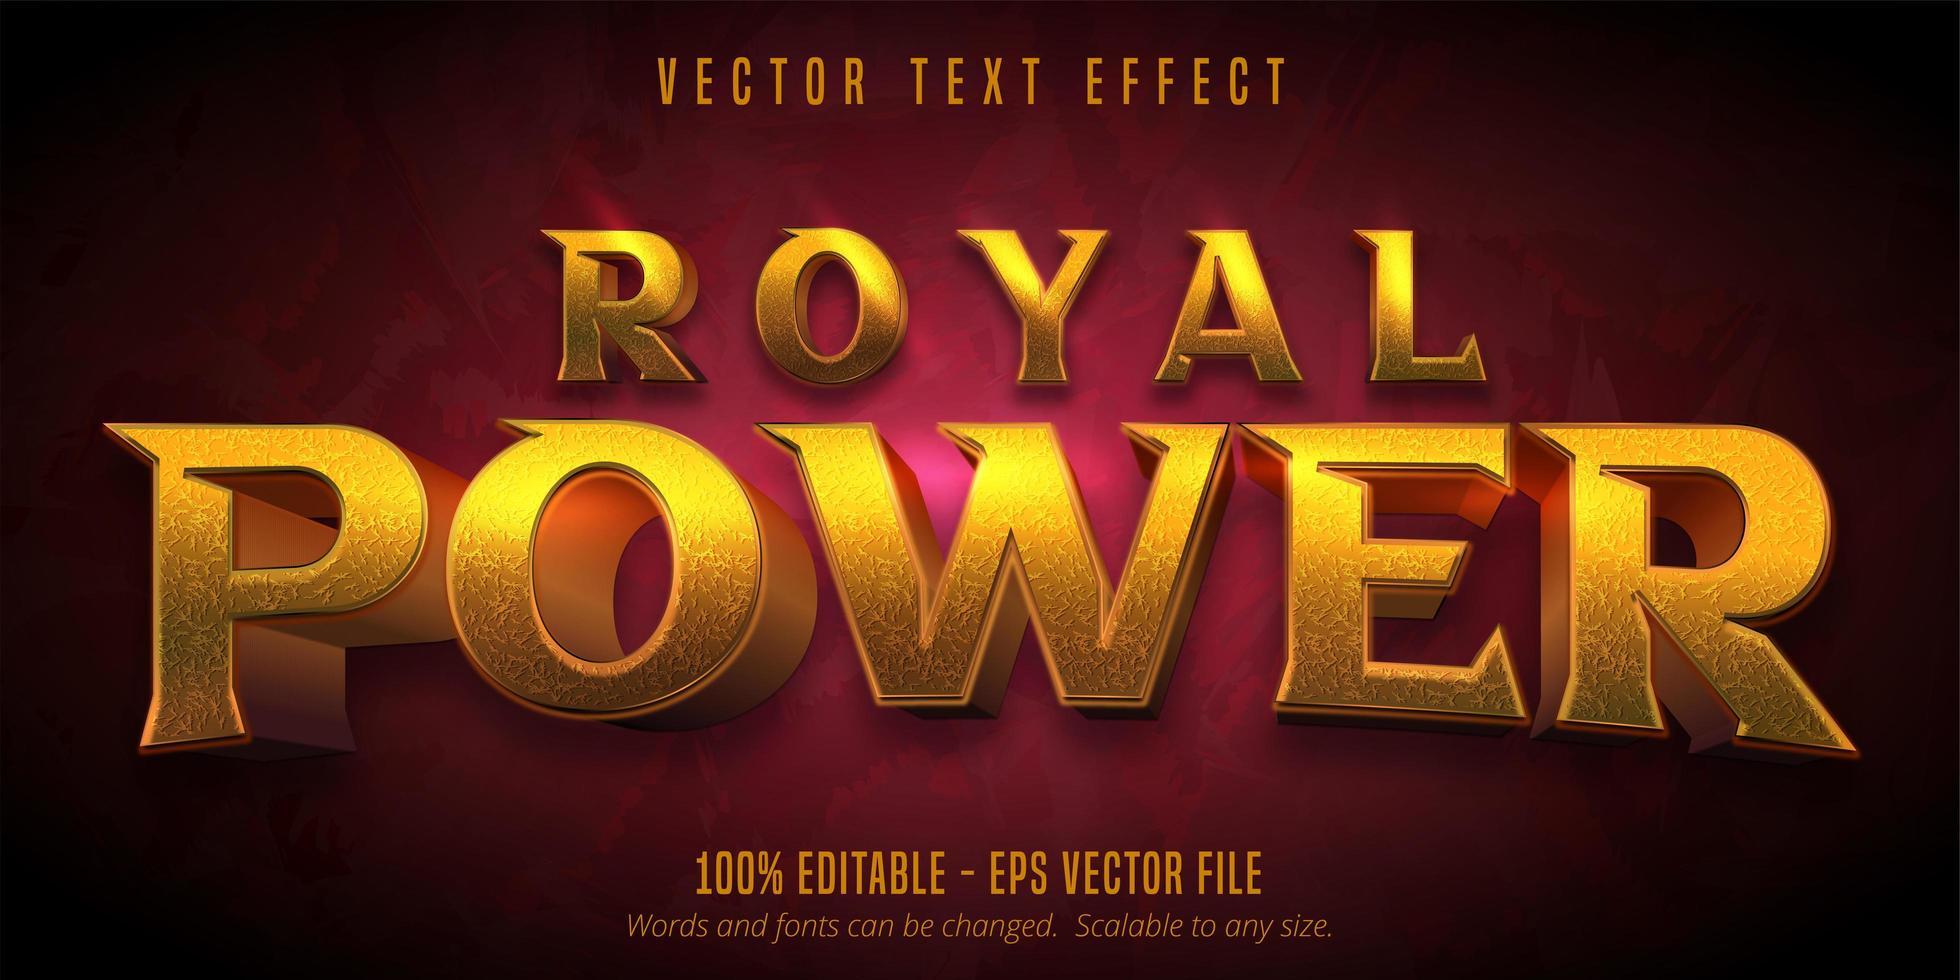 kunglig kraft gyllene texturerad texteffekt vektor